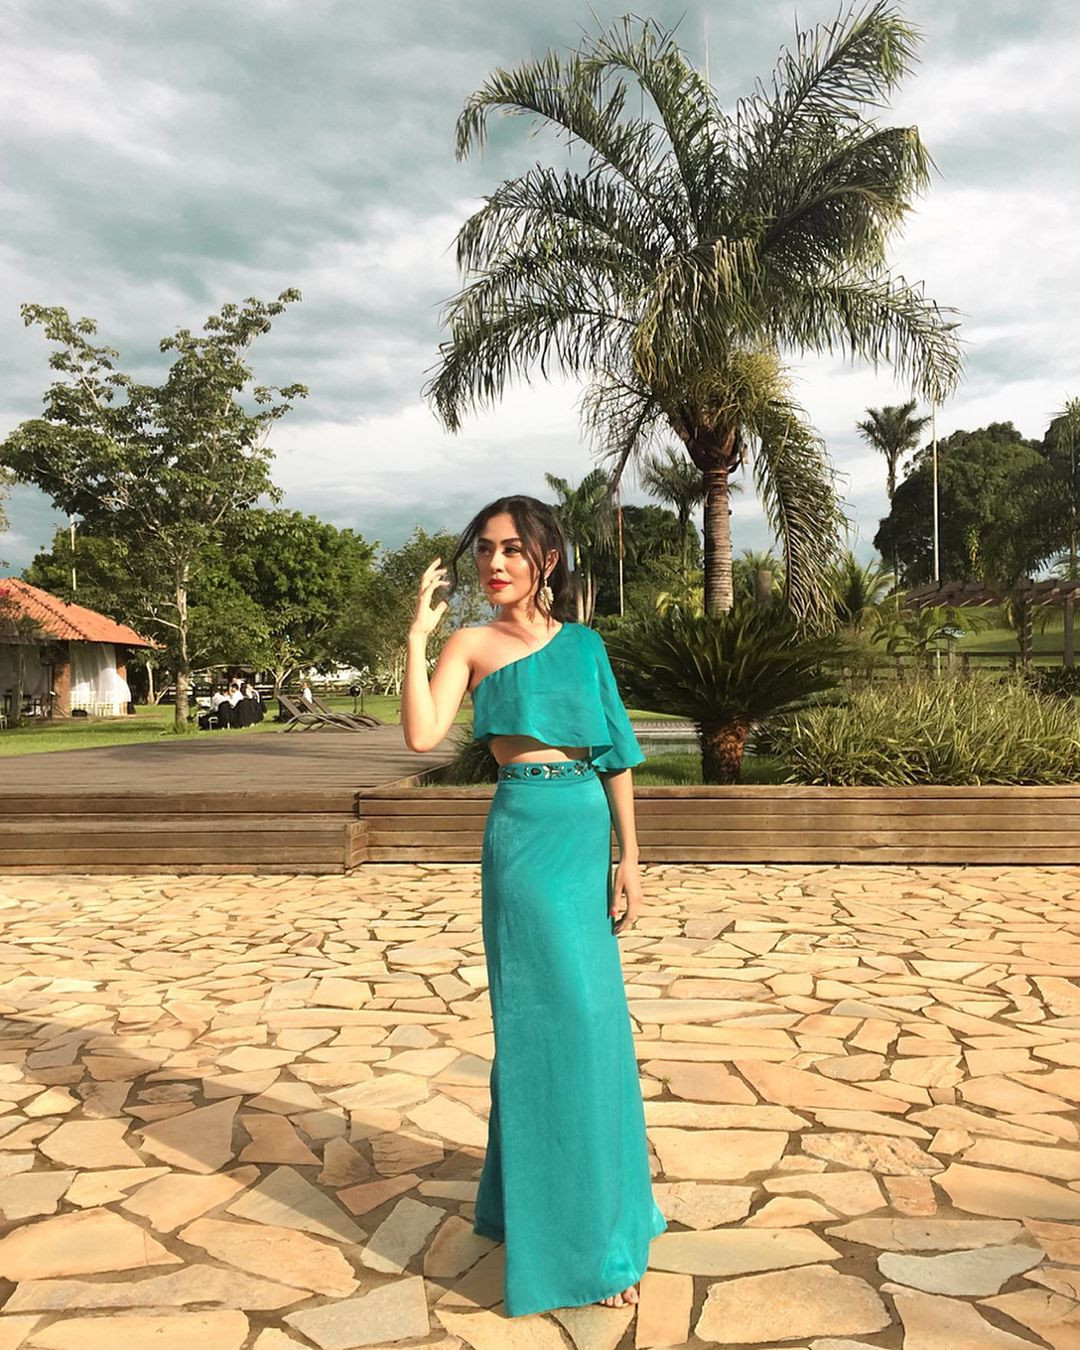 thaisi dias, miss madeira mamore mundo 2019. - Página 3 Qiyxx110